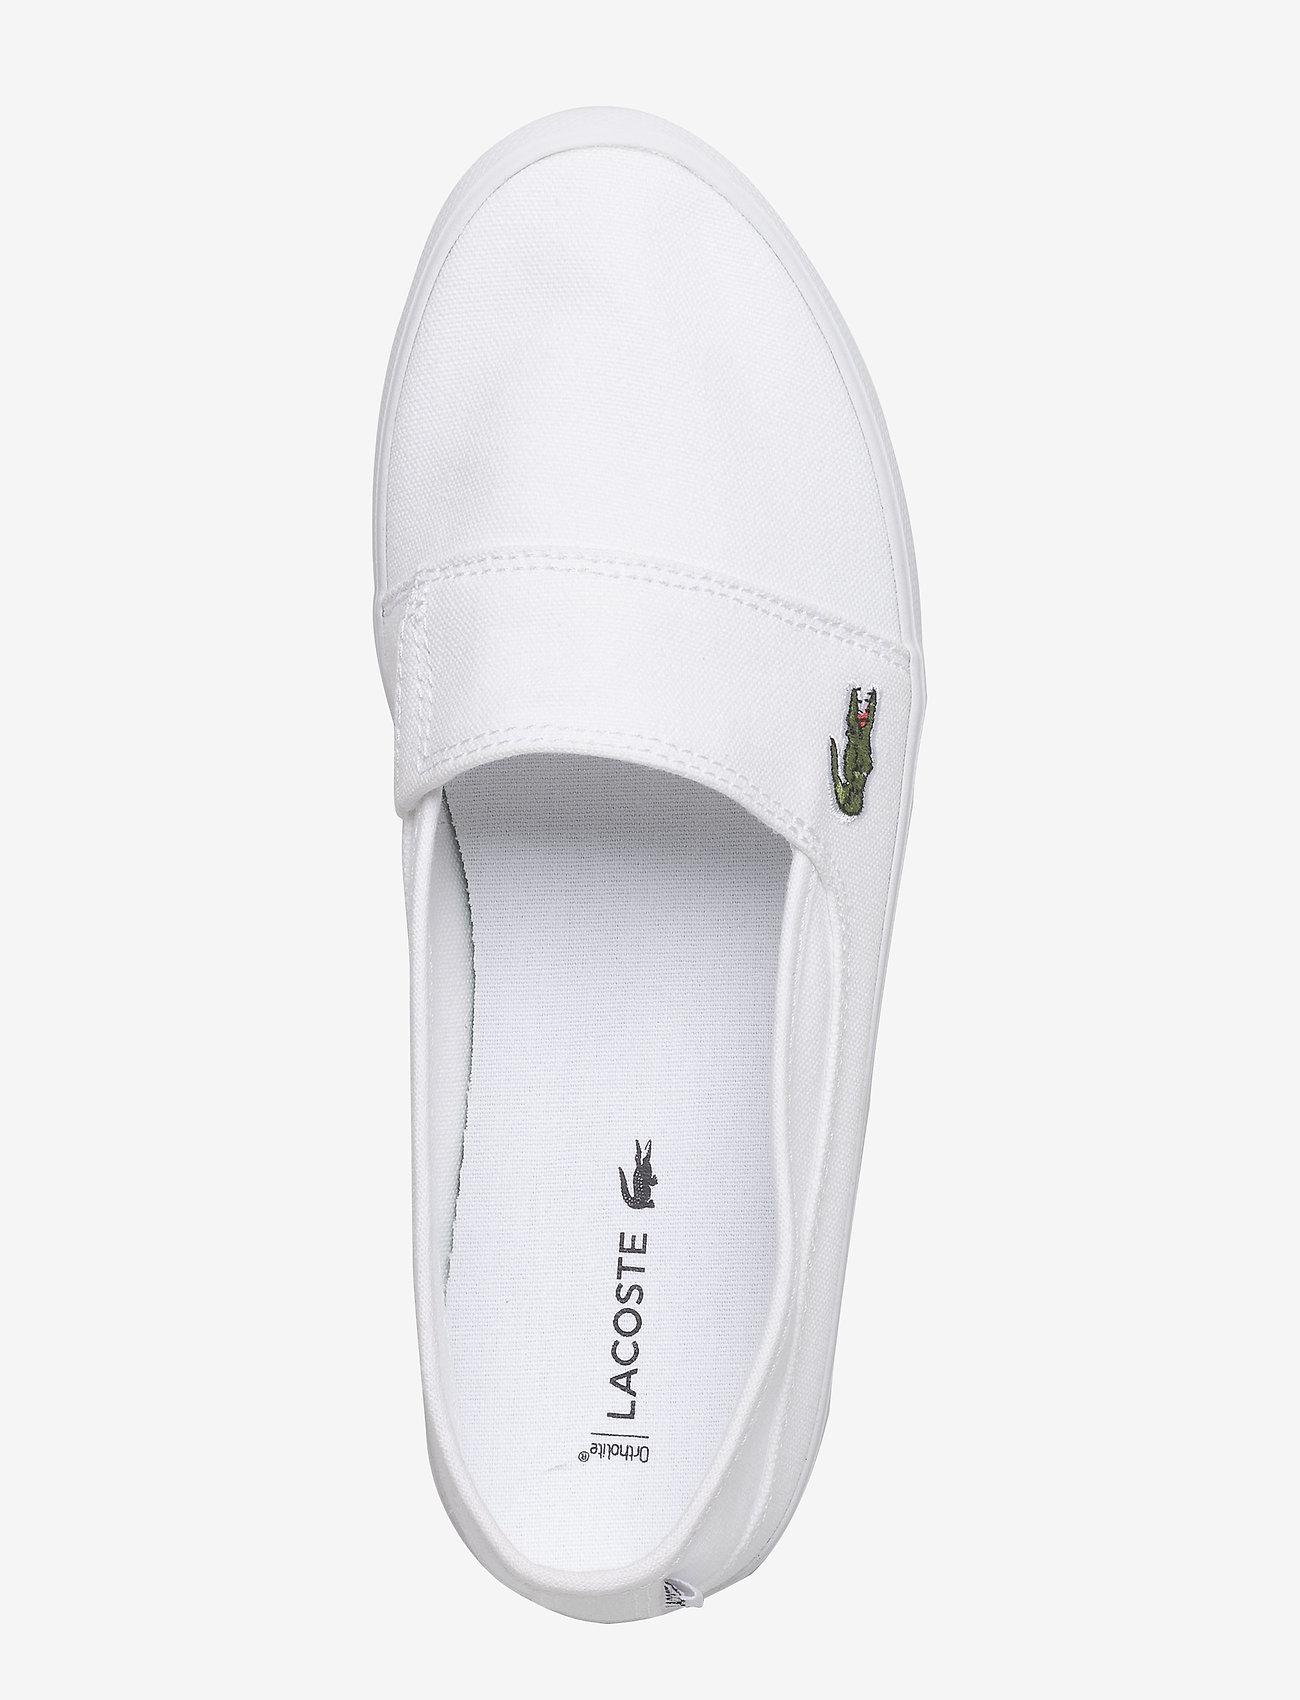 Marice Bl 2 Cfa (Wht Cnv) - Lacoste Shoes